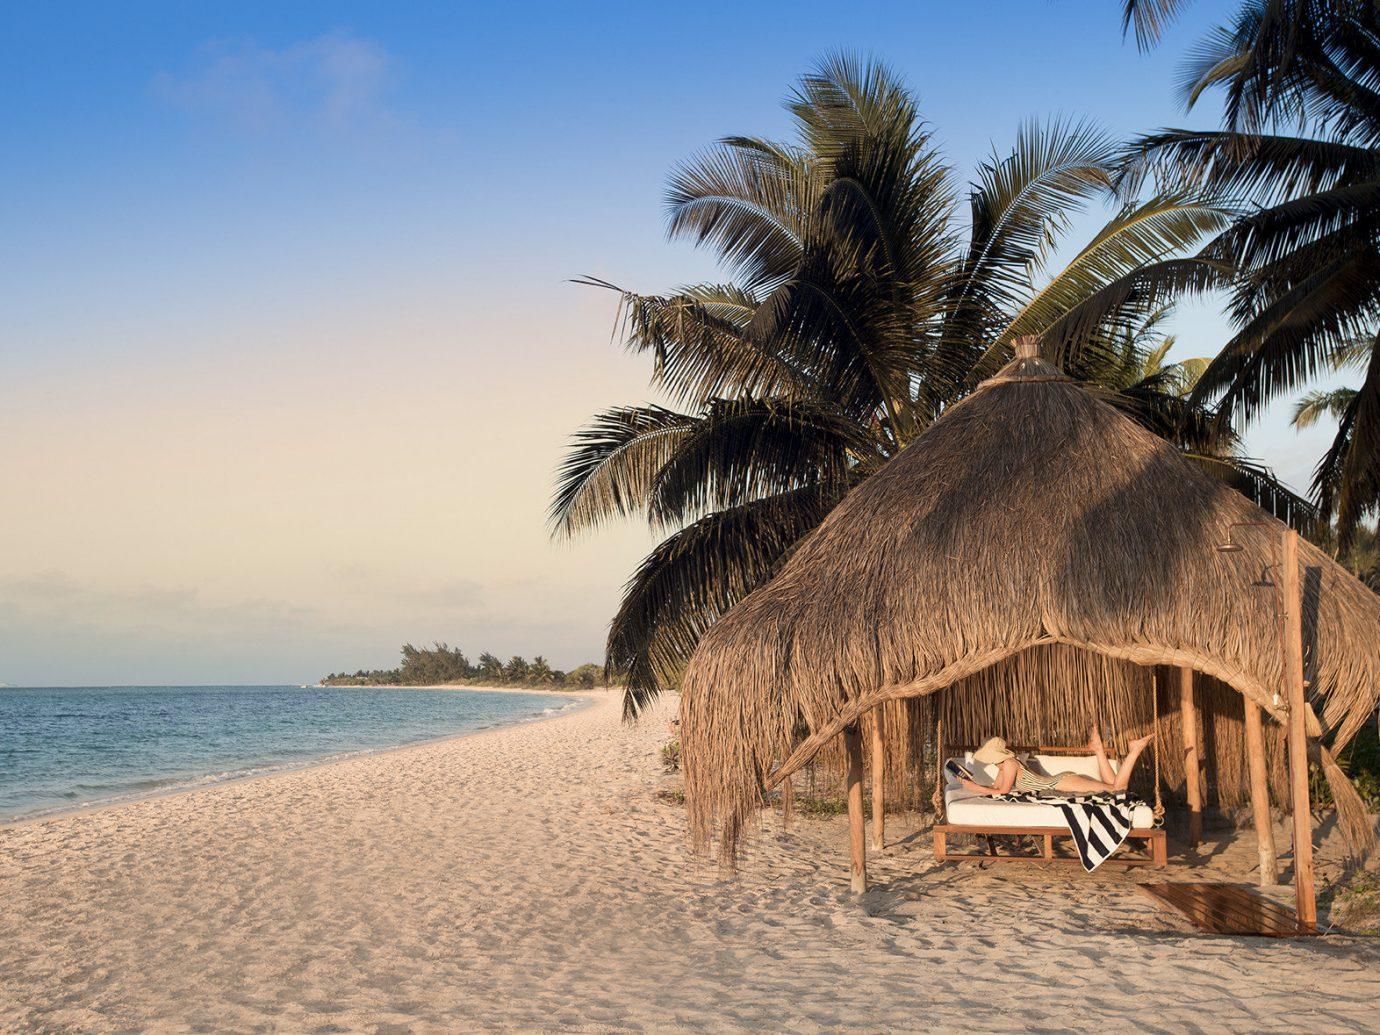 Trip Ideas outdoor tree sky water Beach palm vacation Sea Ocean arecales hut sand Resort Nature shore Coast tropics plant sandy